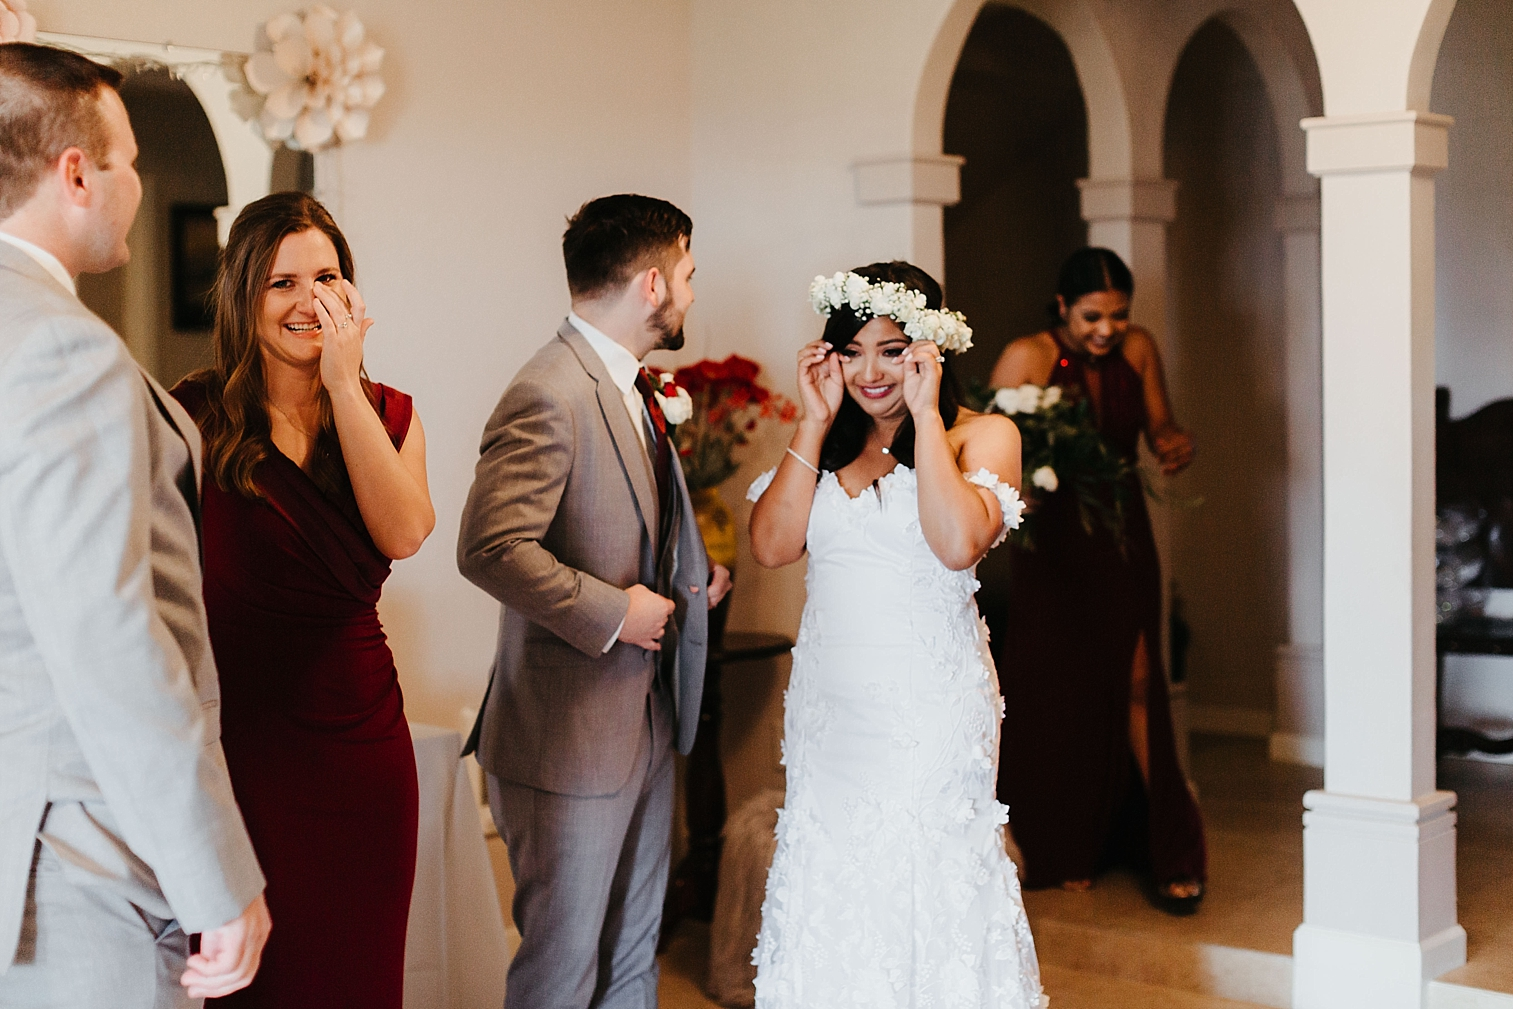 Escondido-Backyard-Wedding-46.jpg